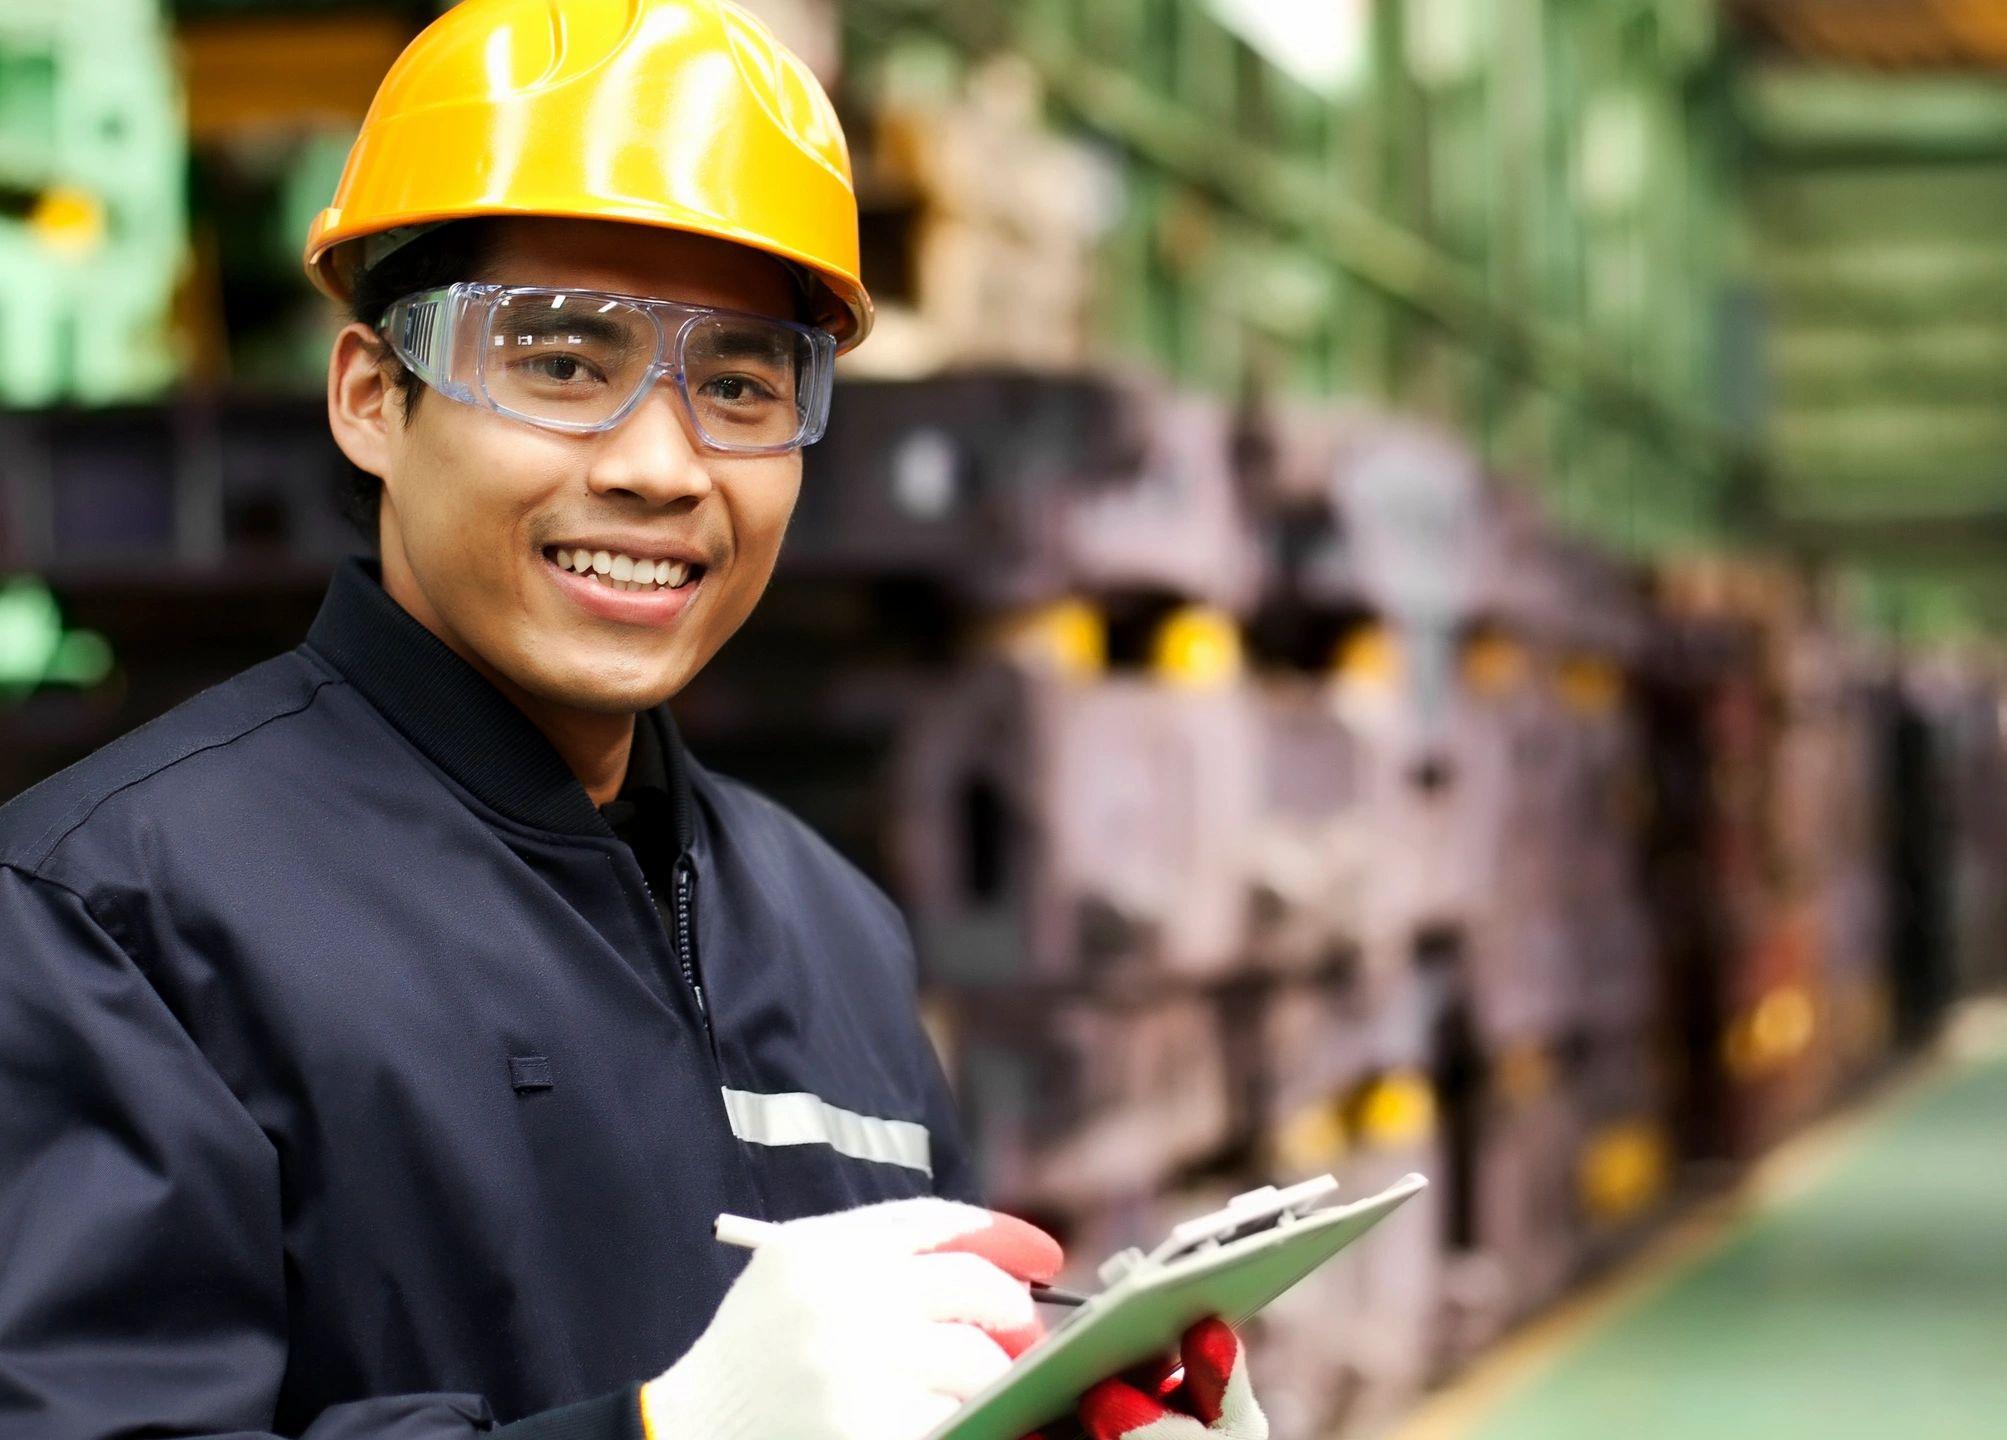 Machine Safety Program